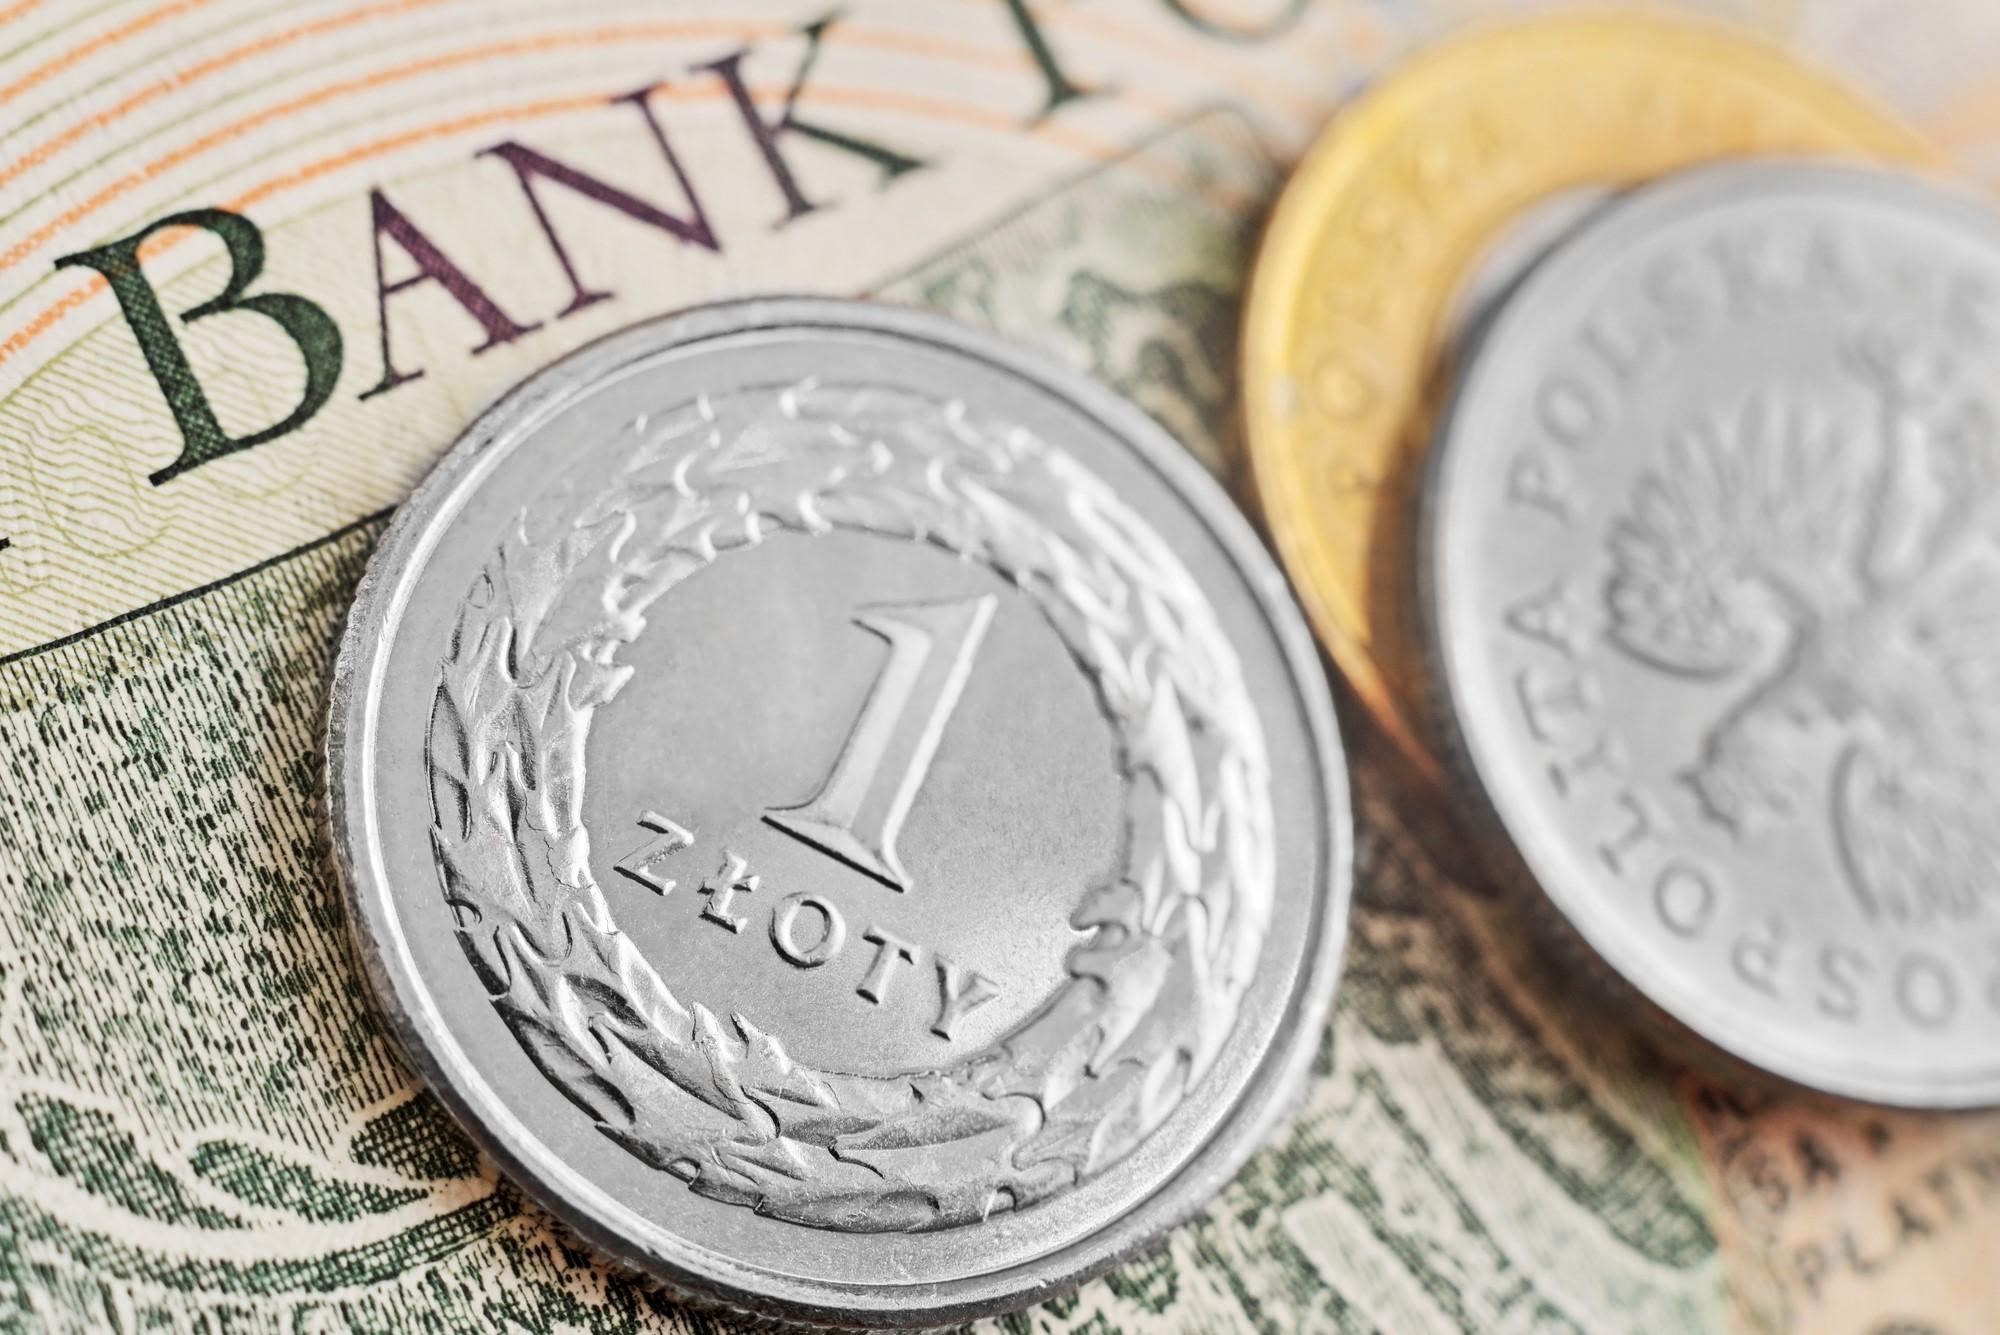 Polish currency, Depositphotos